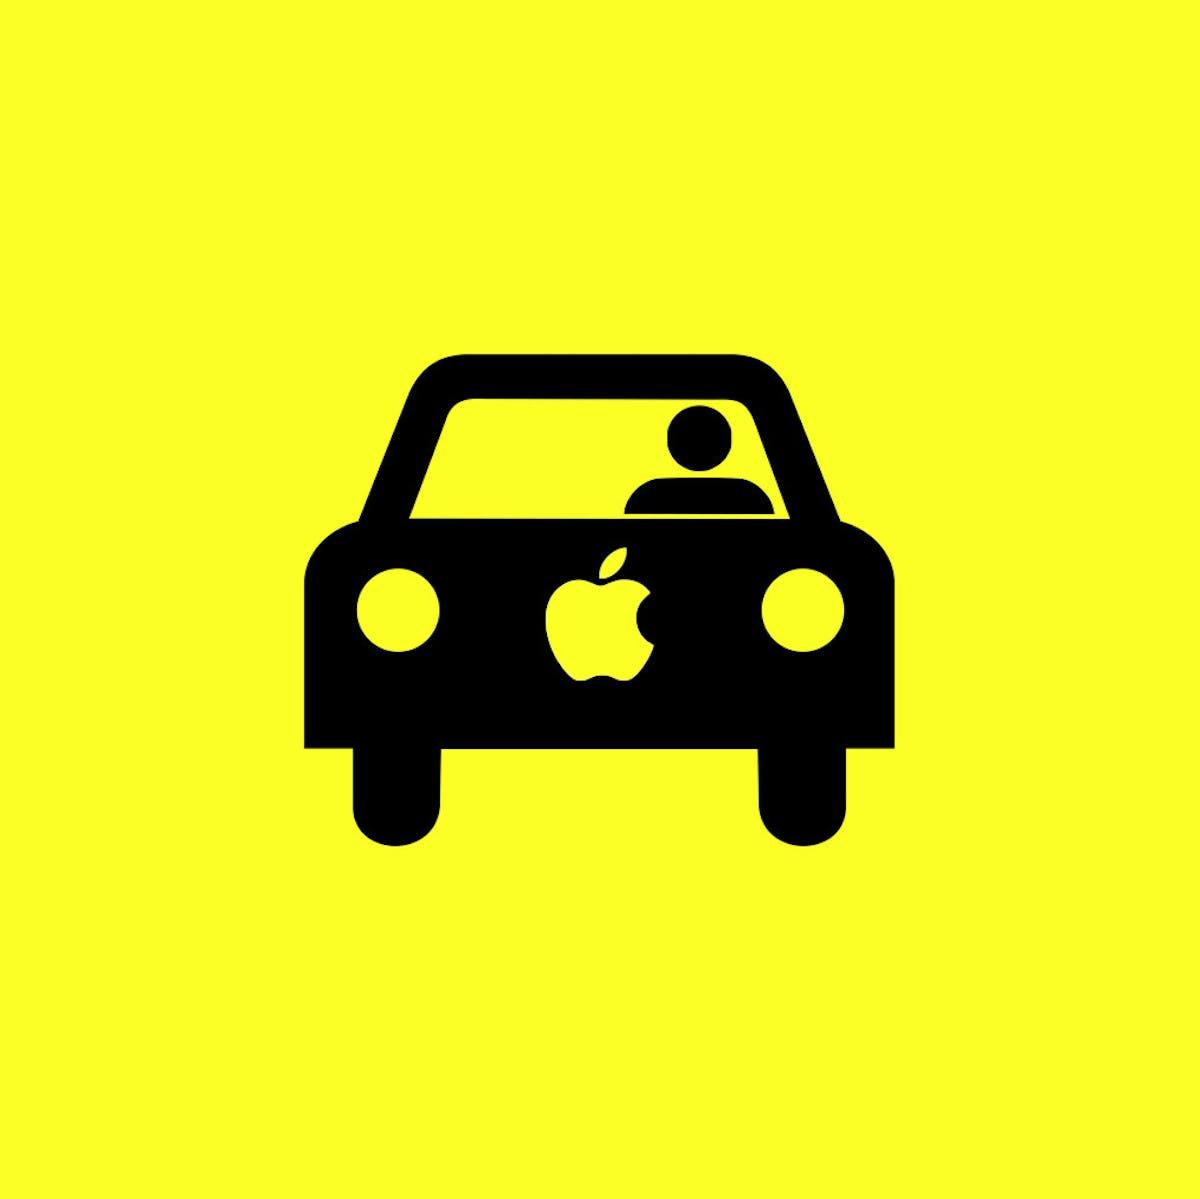 Apple Car: 3 Futuristic Automotive Technologies Apple Patented Last Month